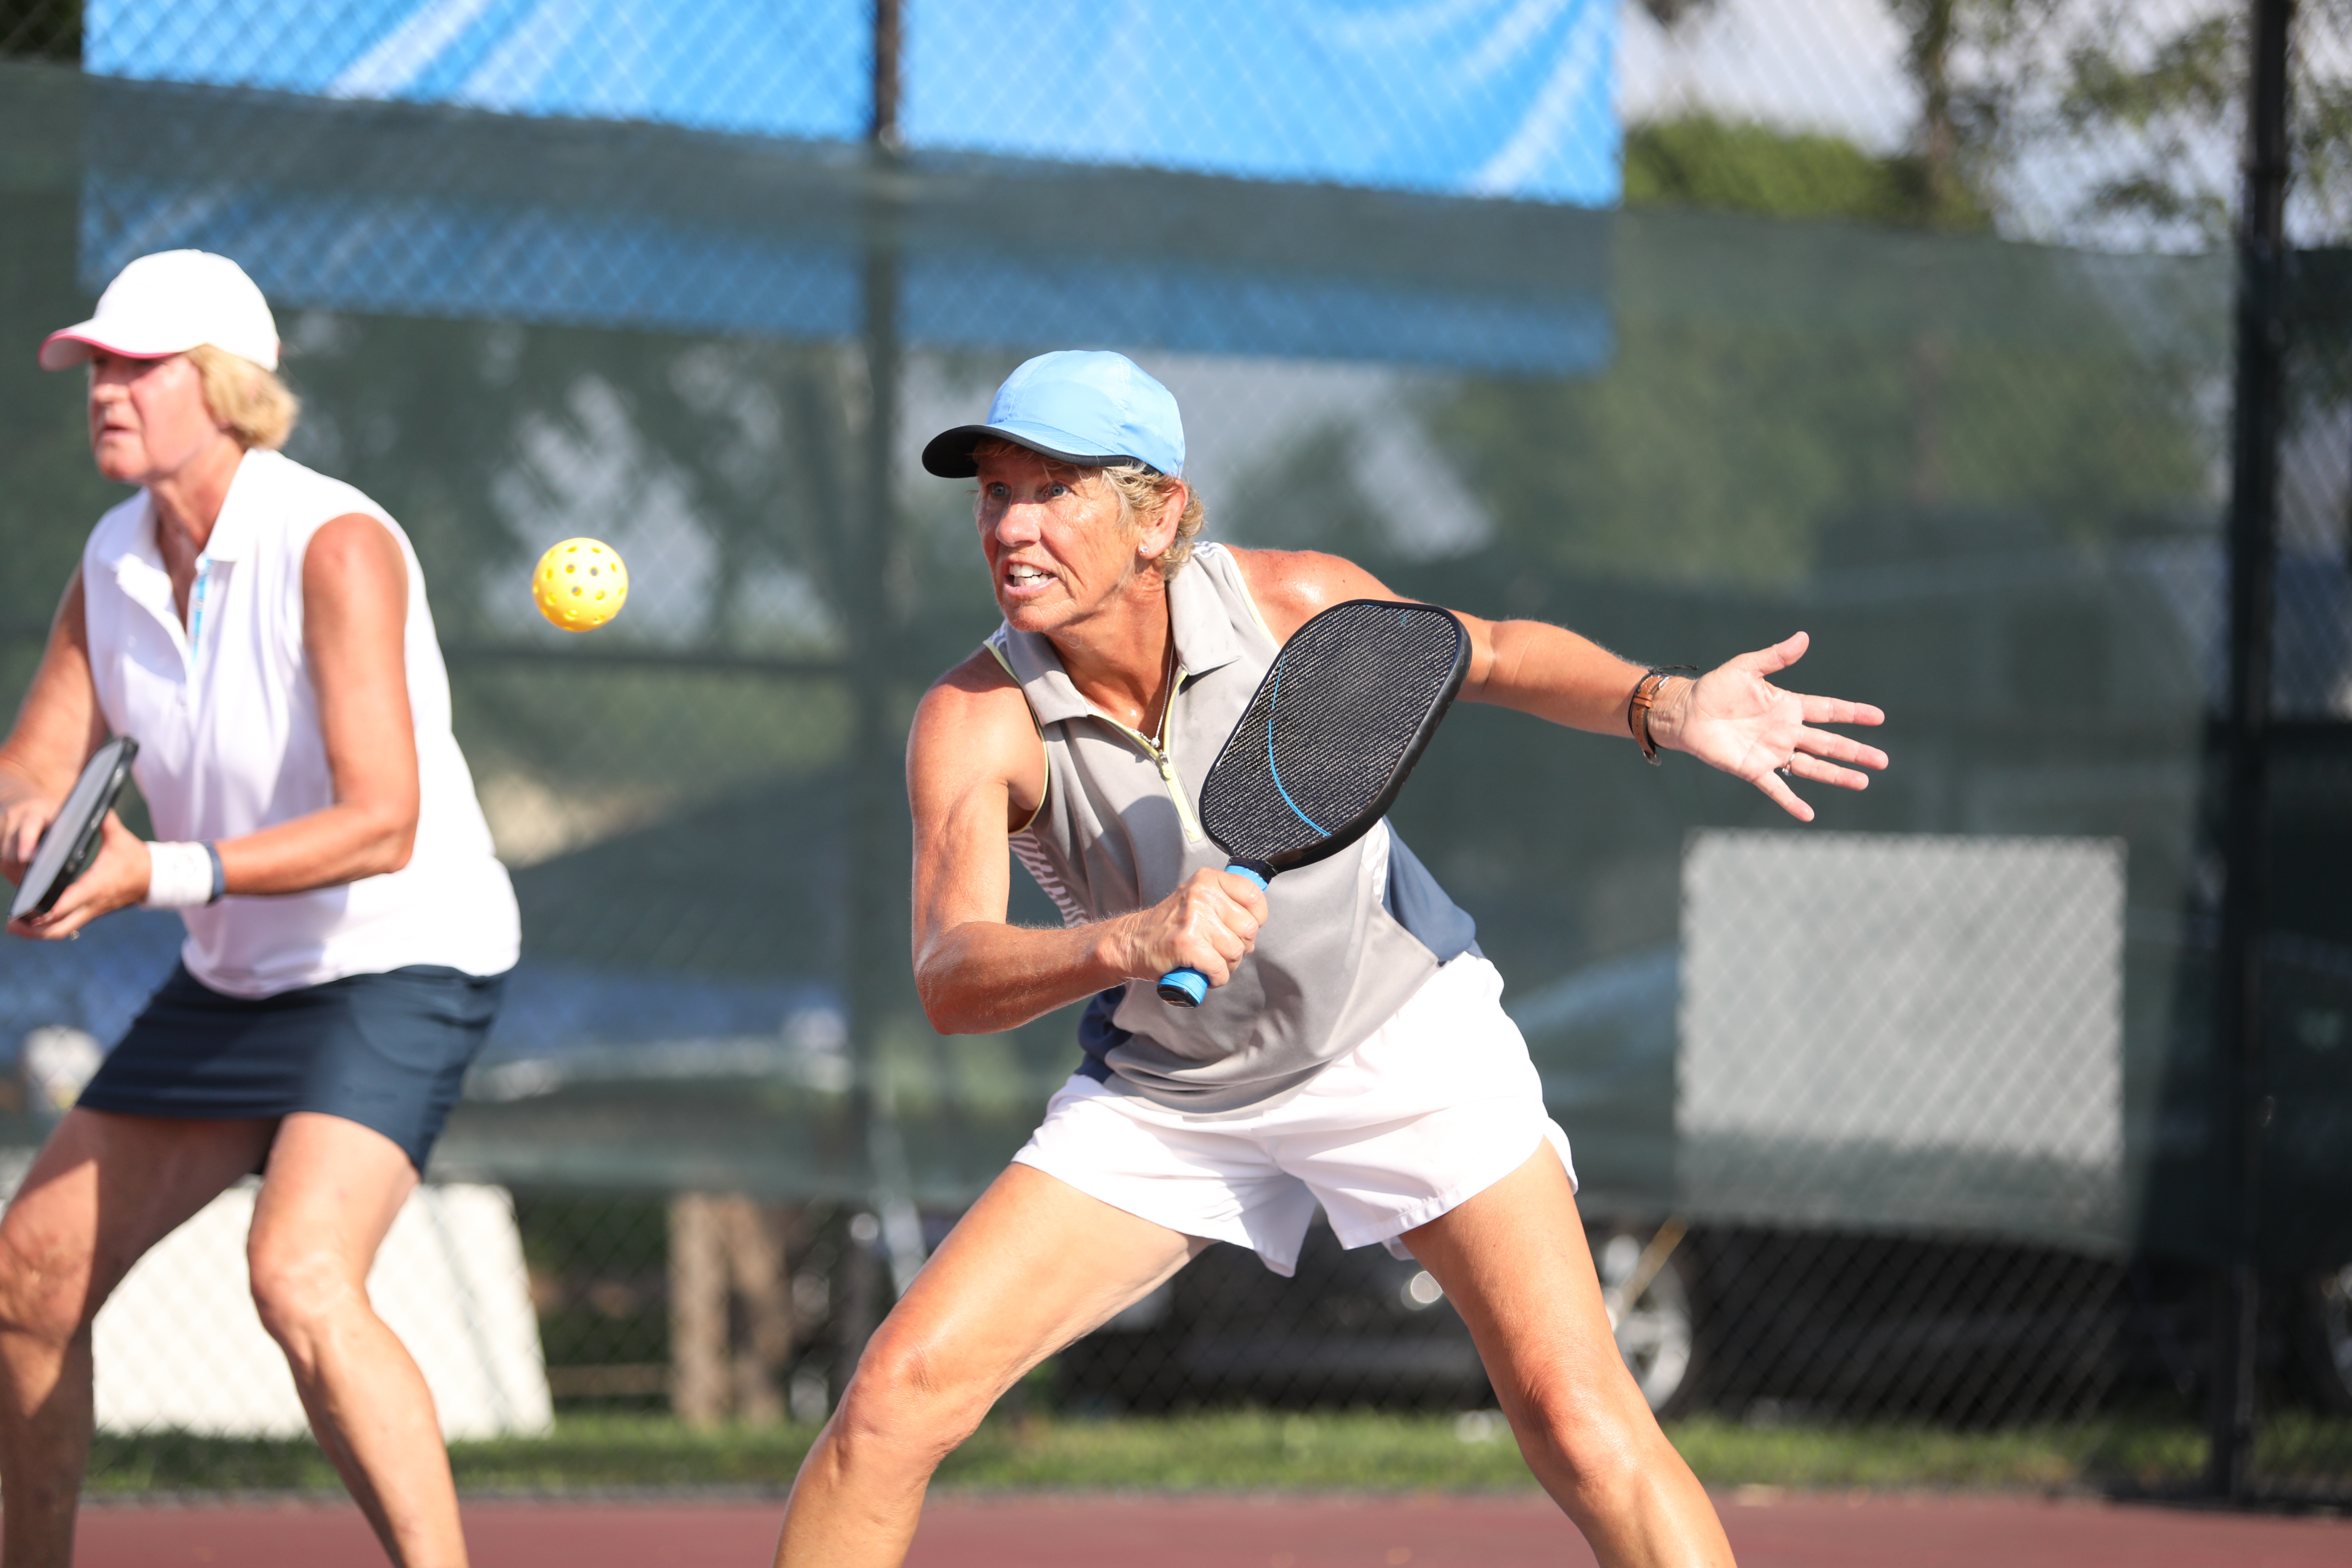 Women playing pickle-ball